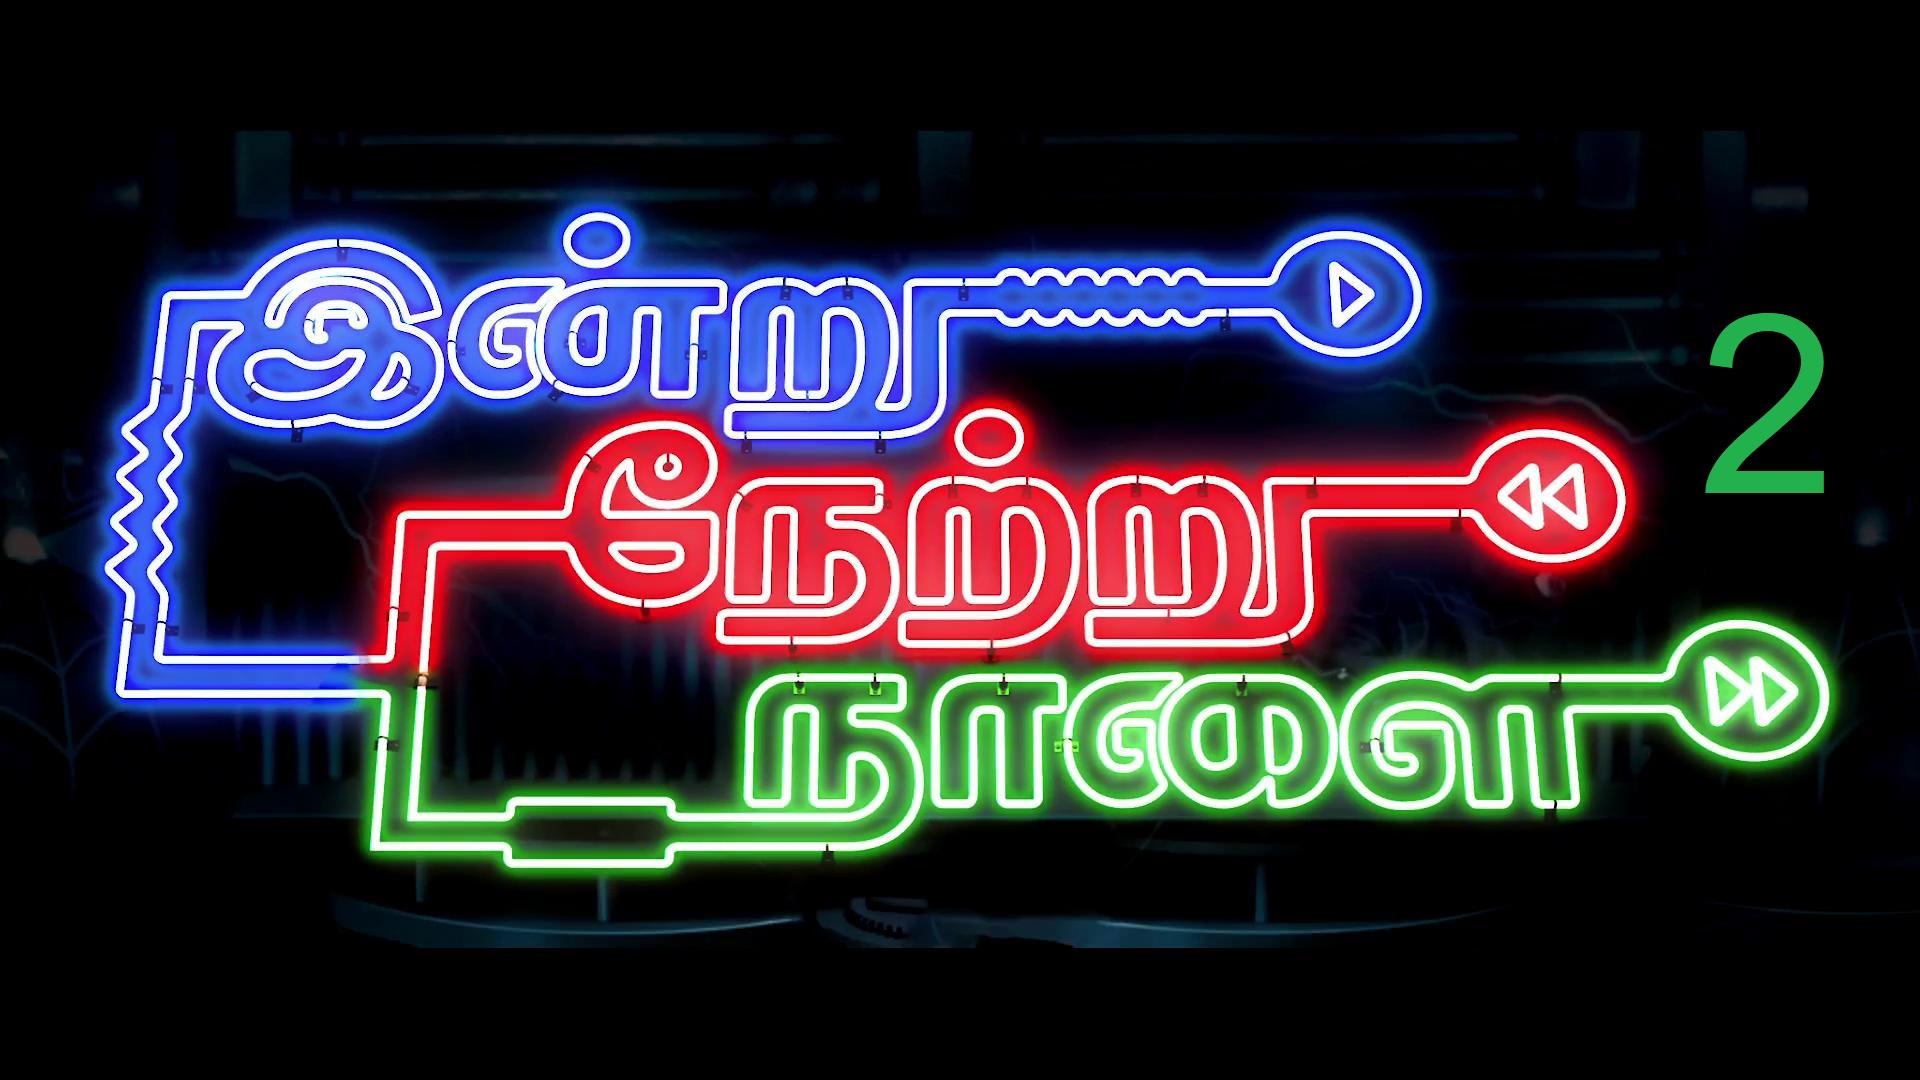 Indru Netru Naalai 2 TamilRockers